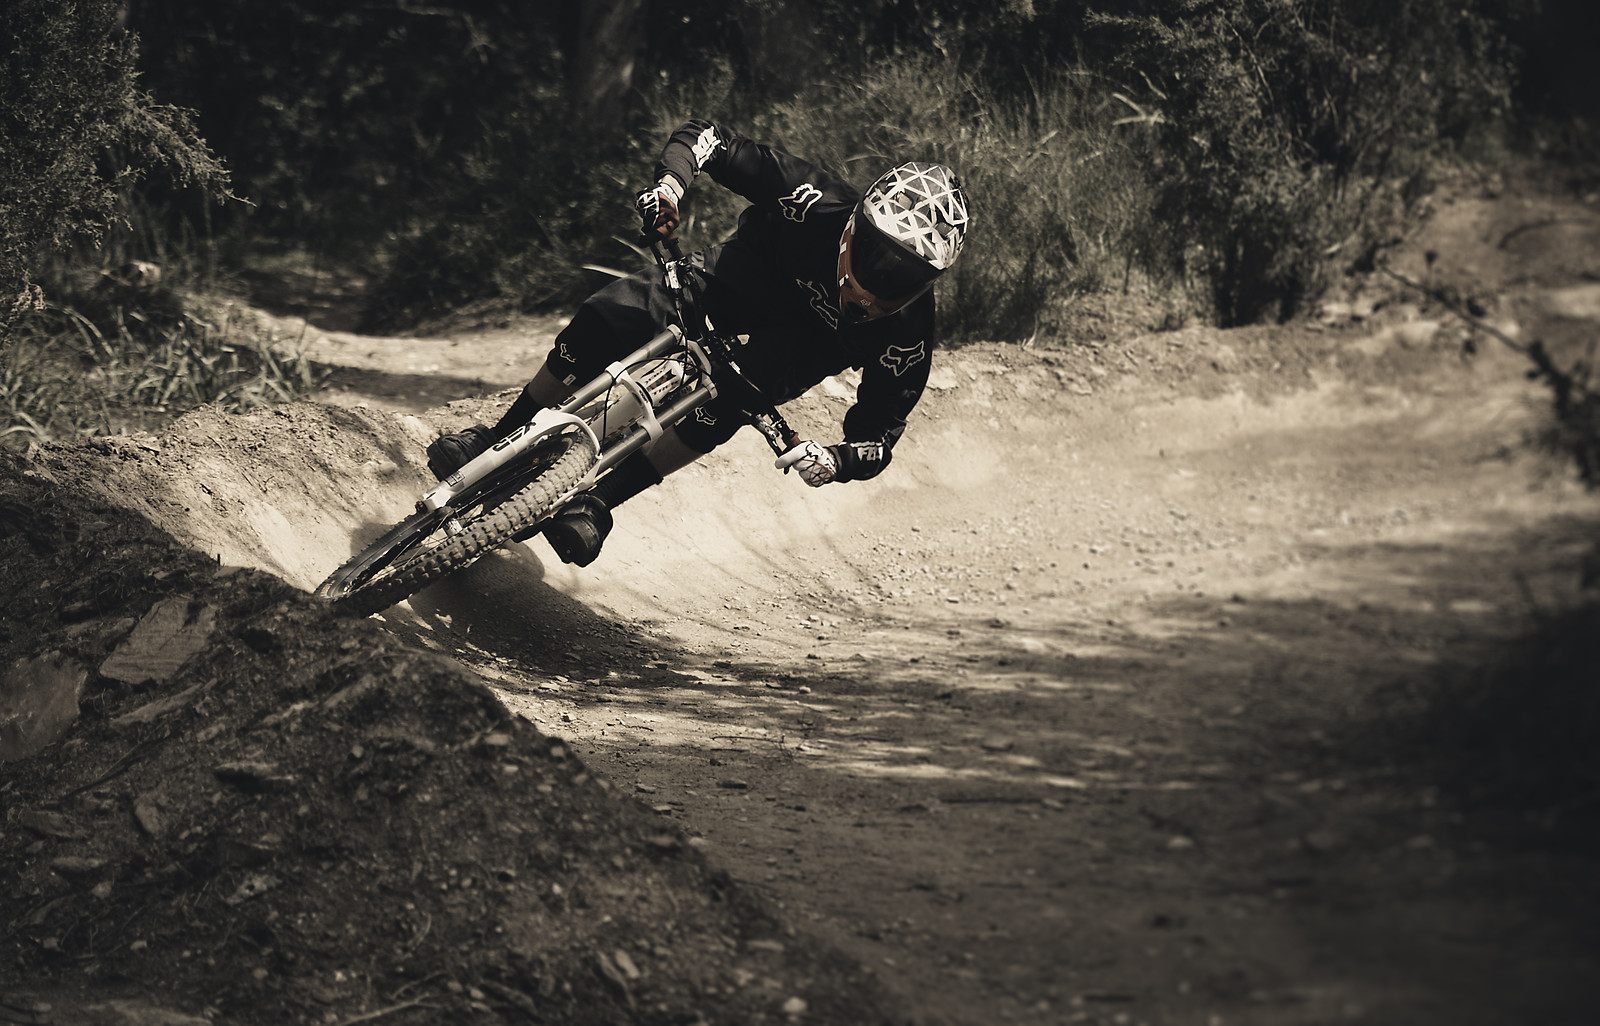 Stamatis on the Burm - pappoulakos - Mountain Biking Pictures - Vital MTB